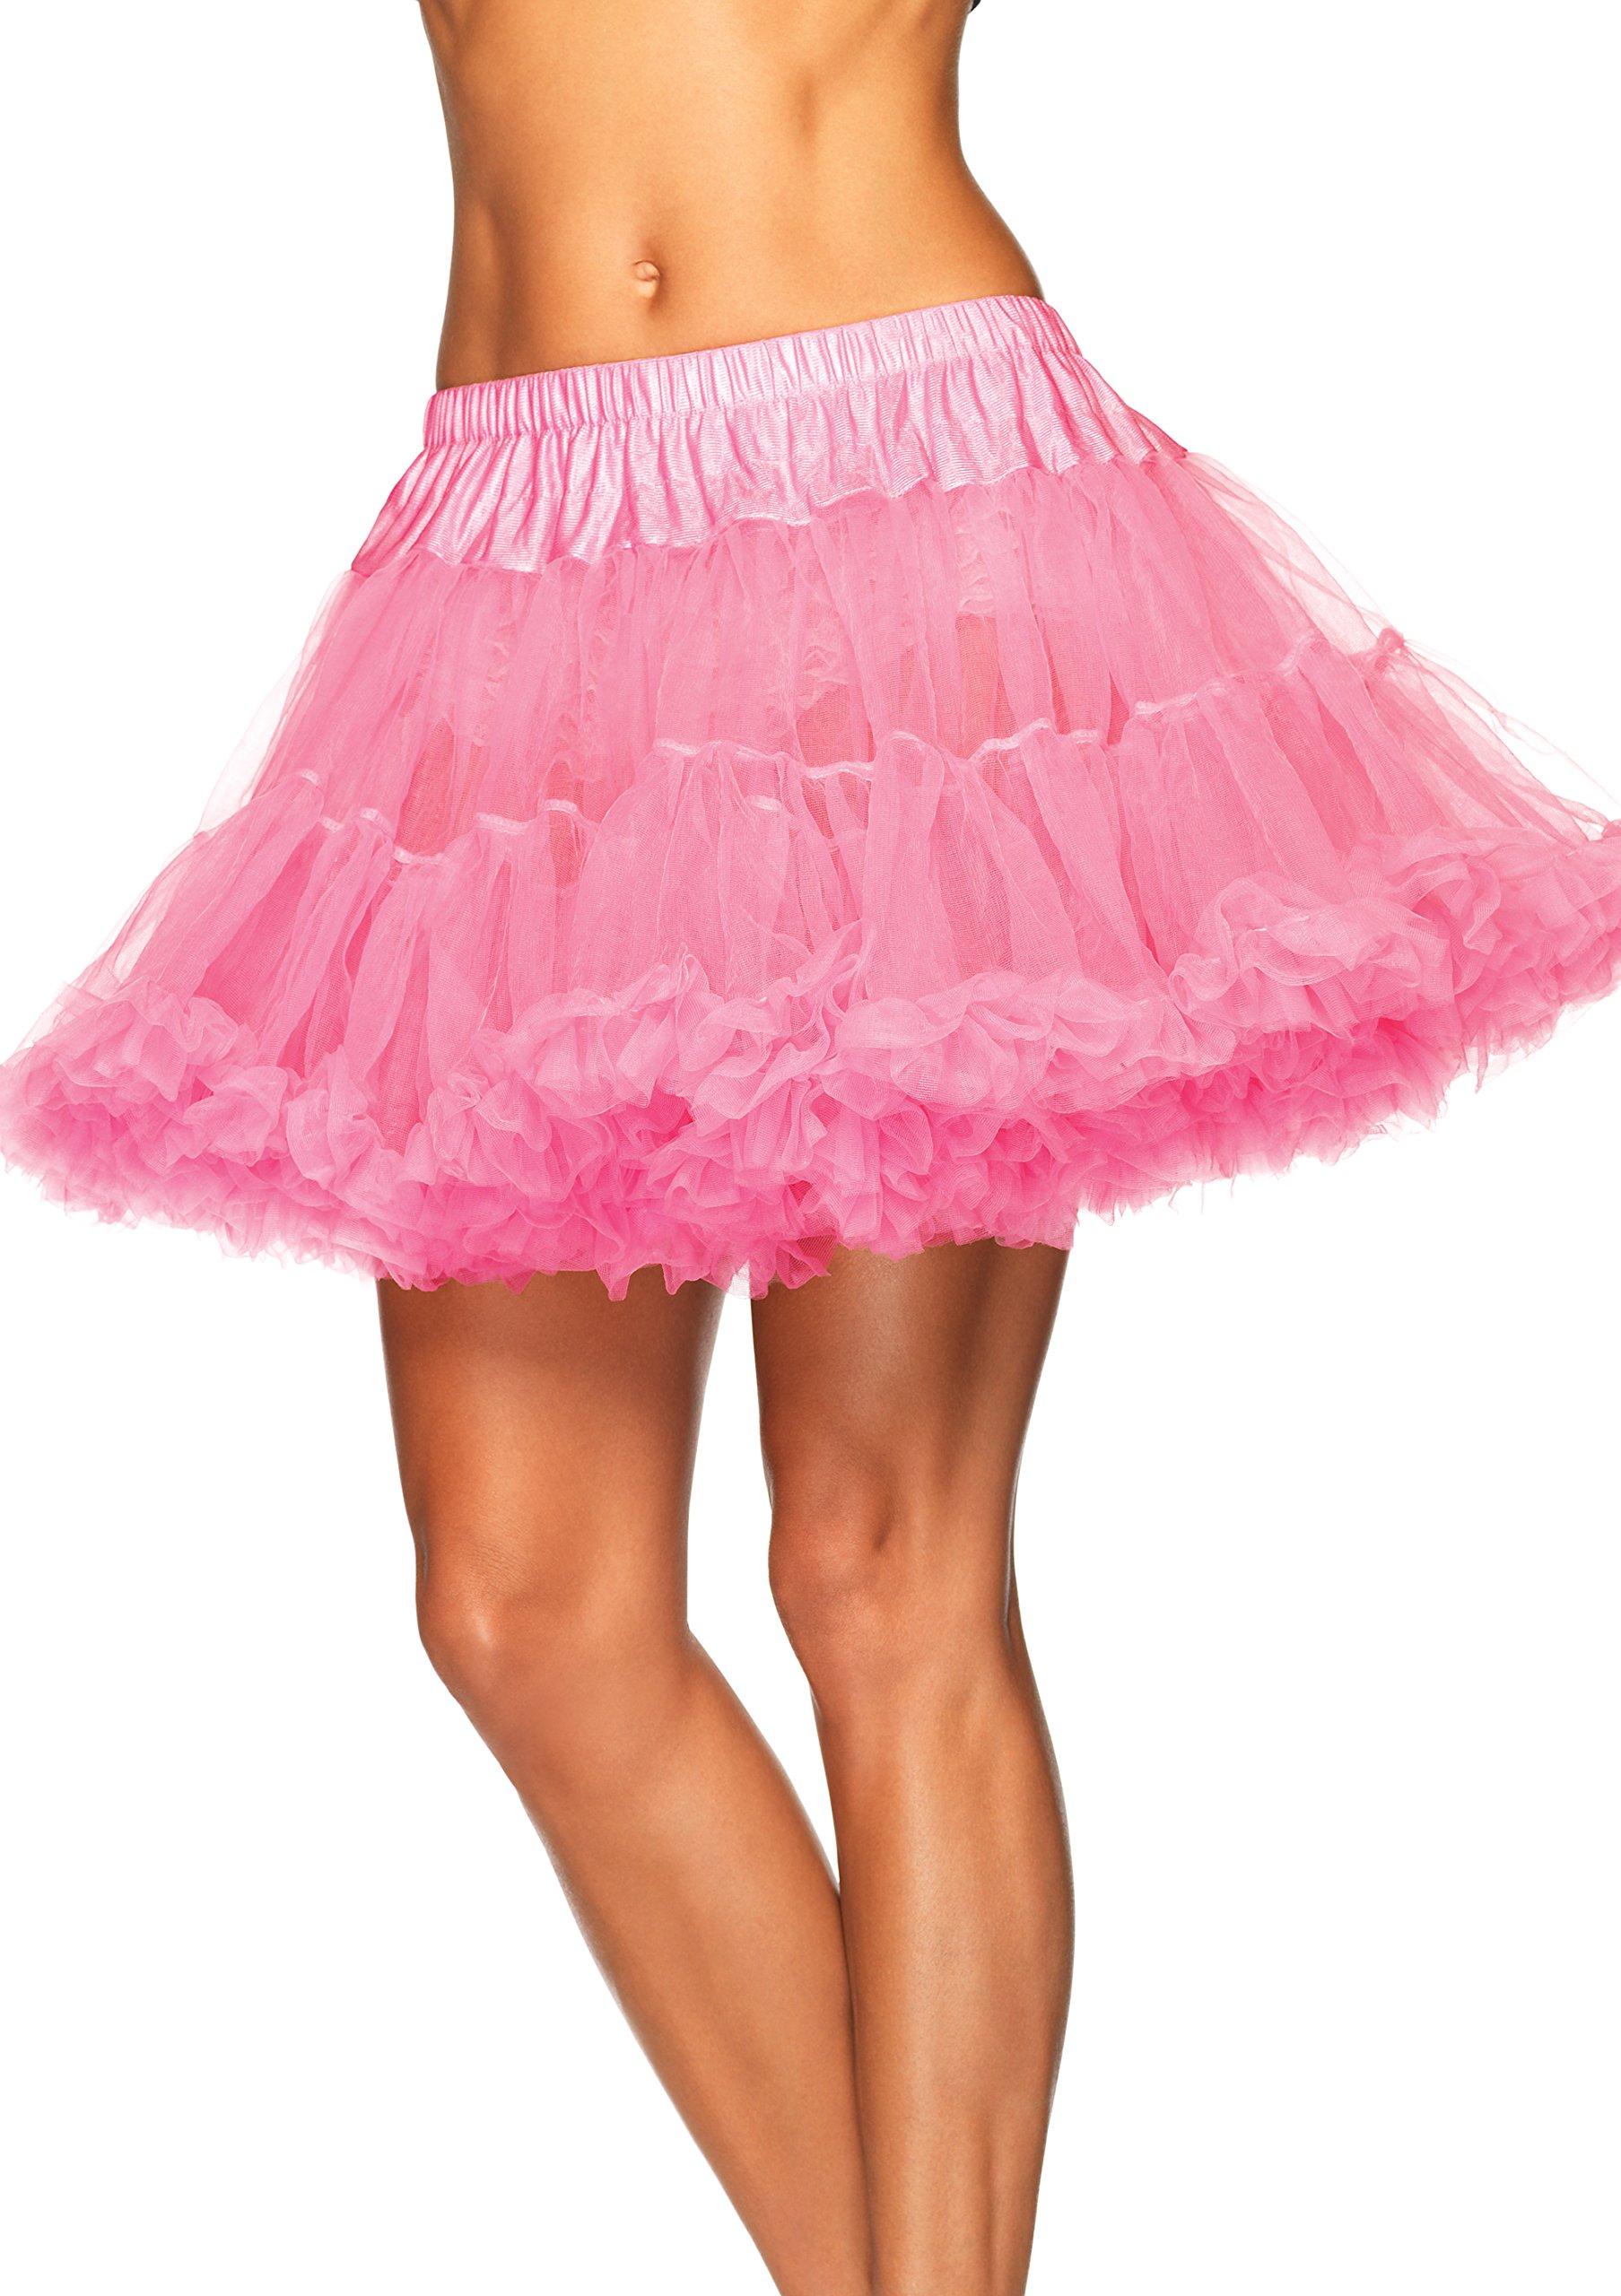 Leg Avenue Women's Petticoat, Light Pink, One Size